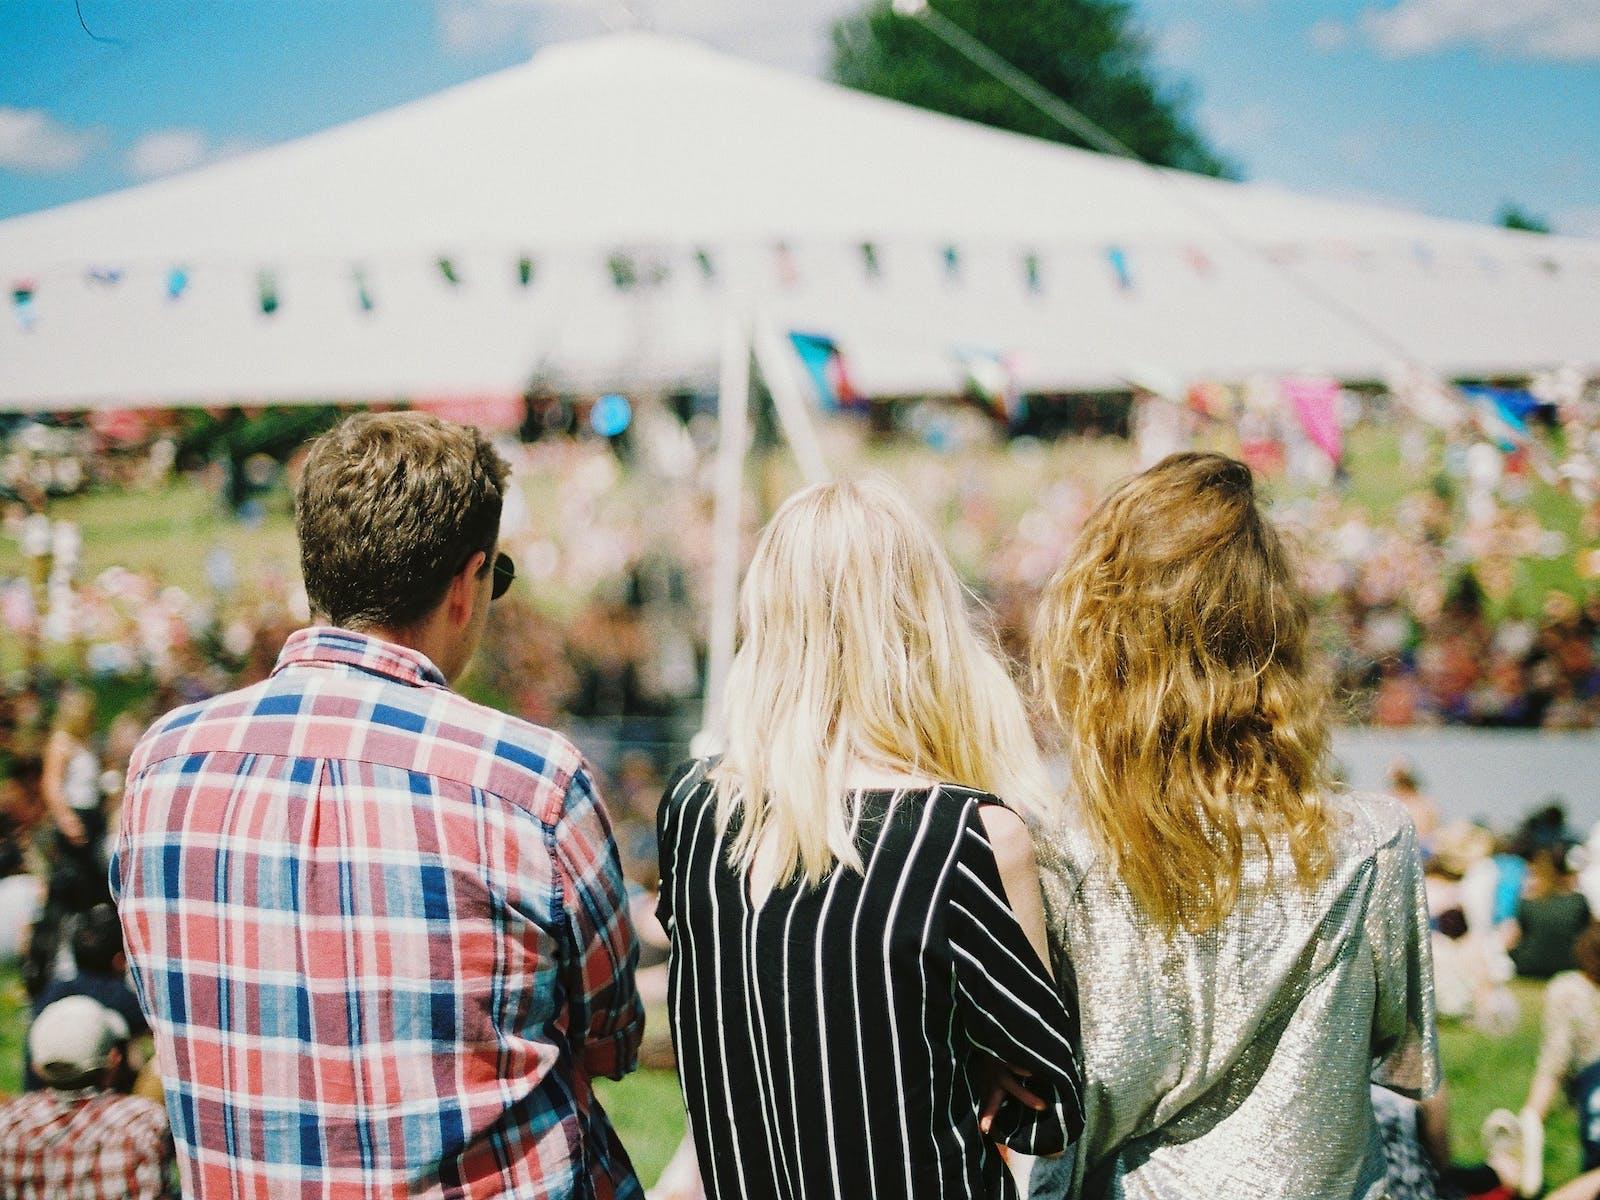 Stagecoach music festival in Coachella Valley, CA